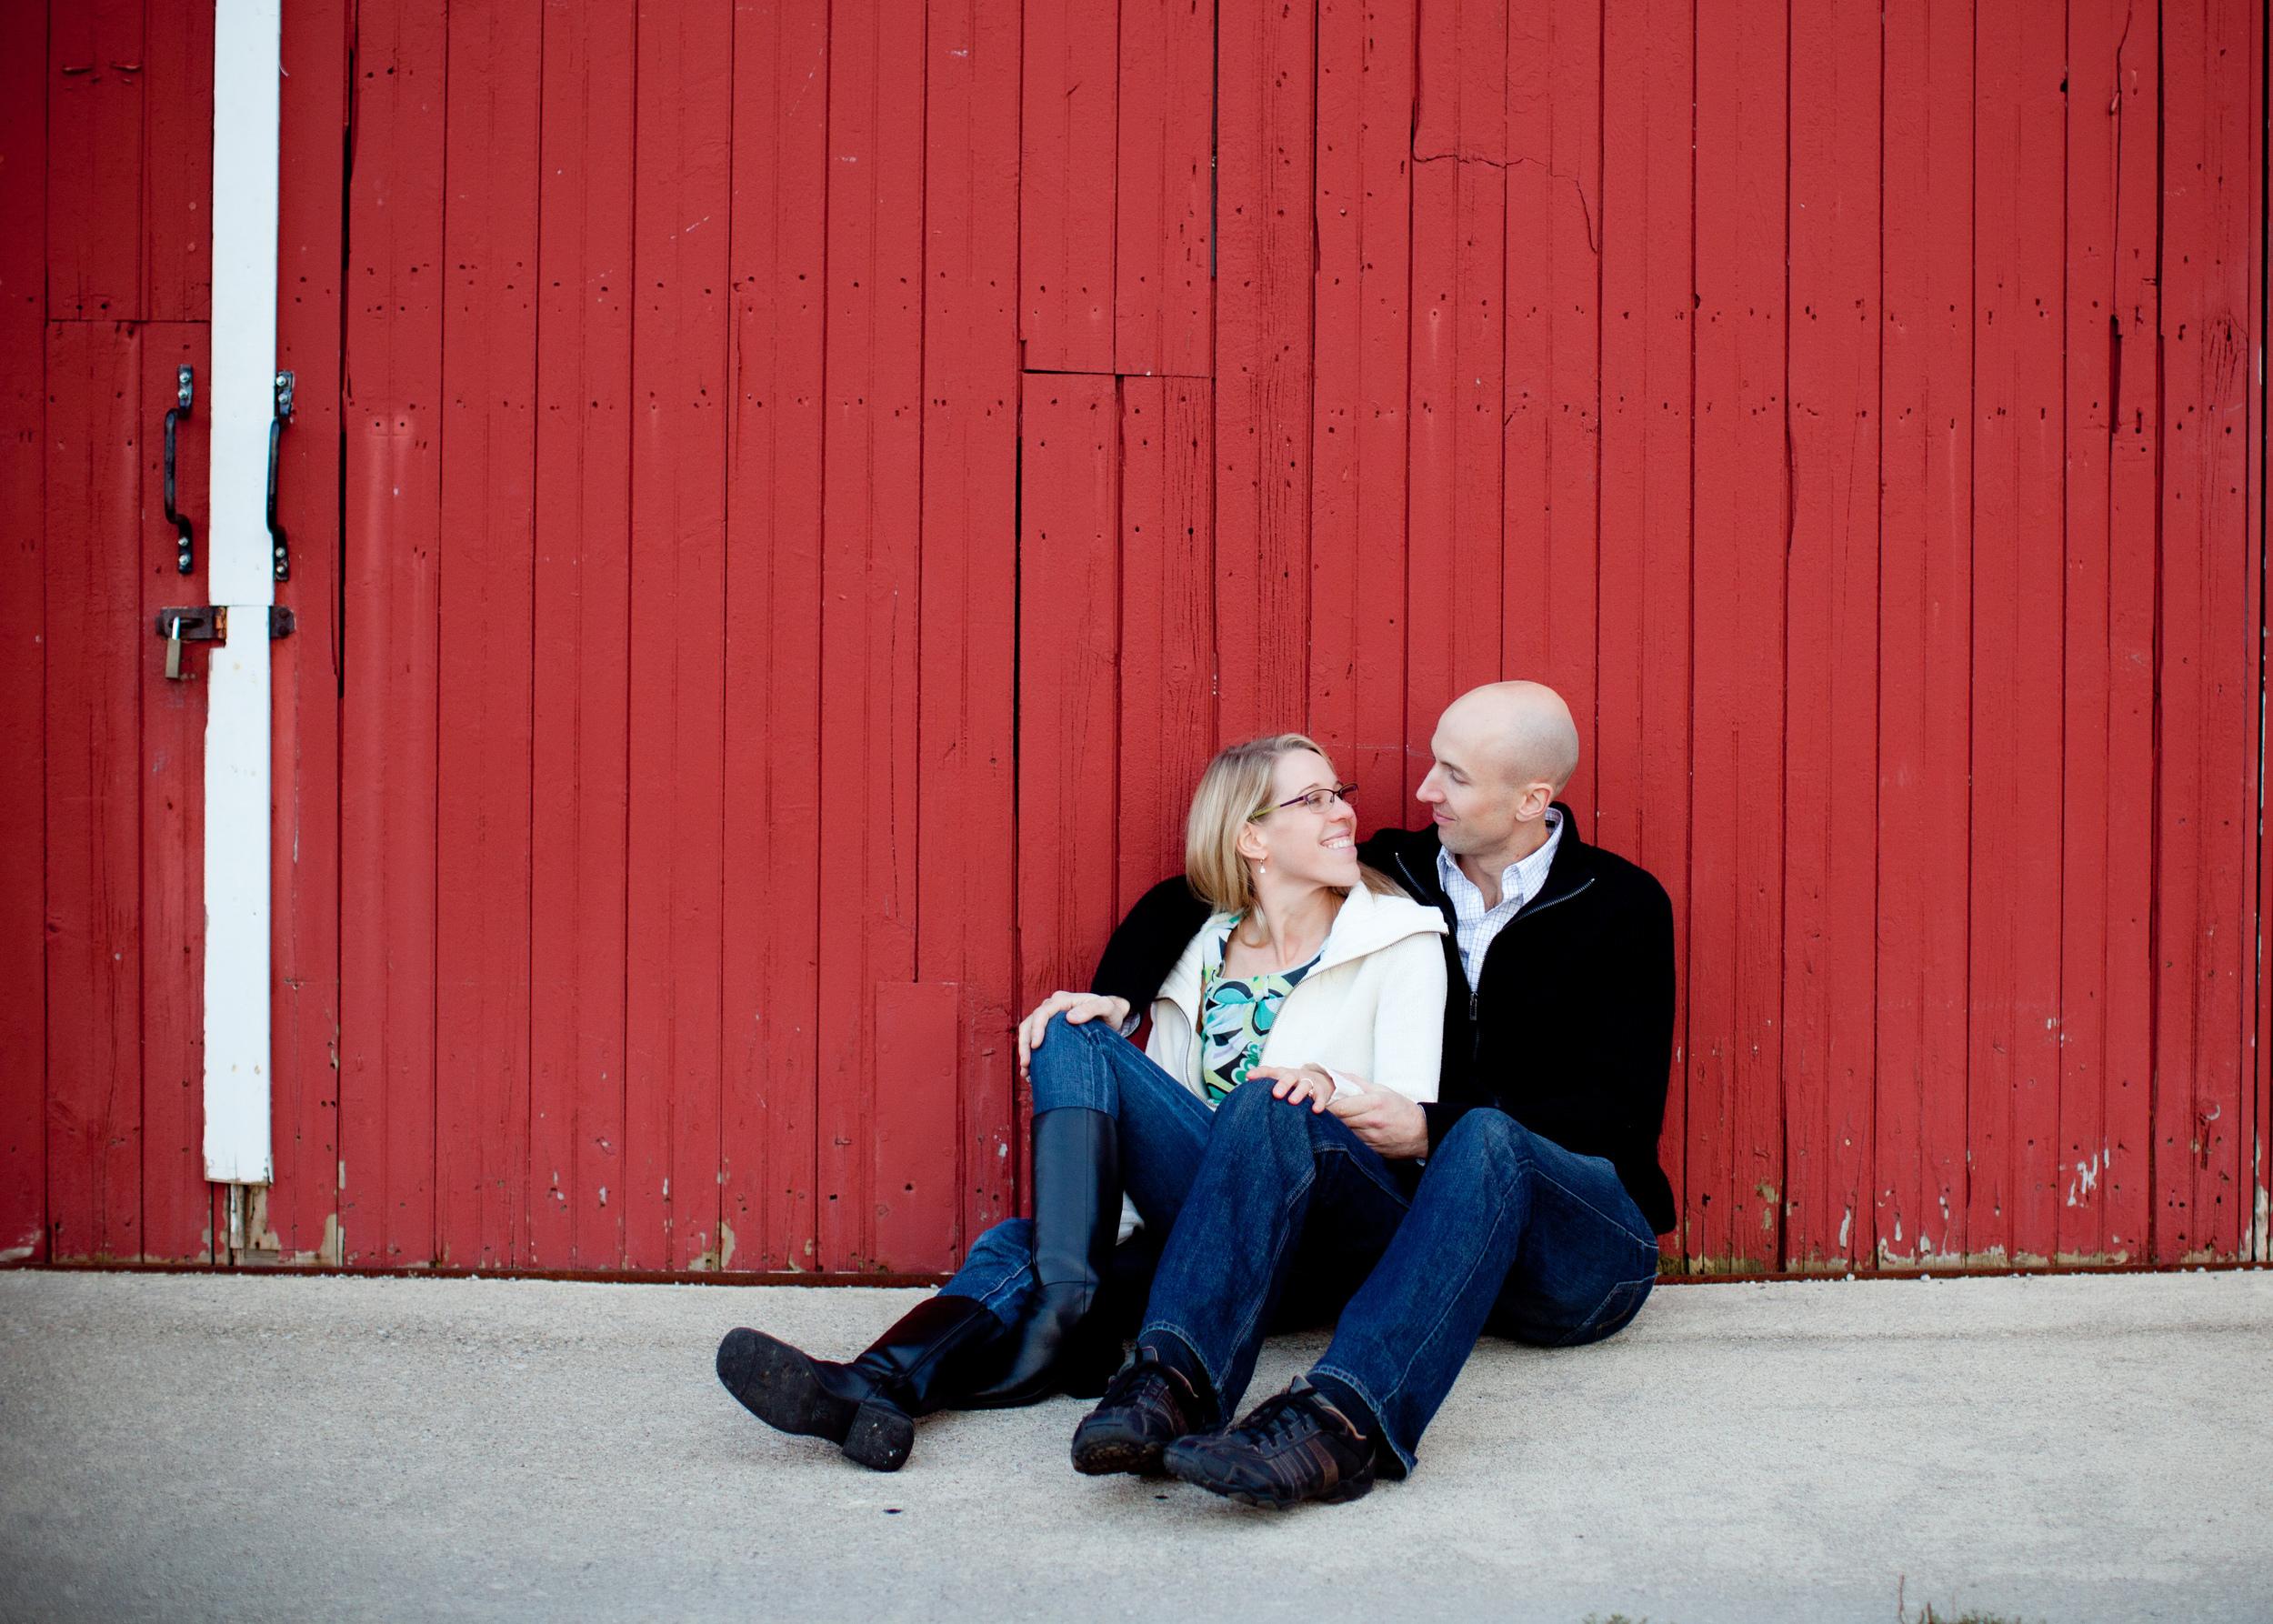 David&Ruth_110412_21_r